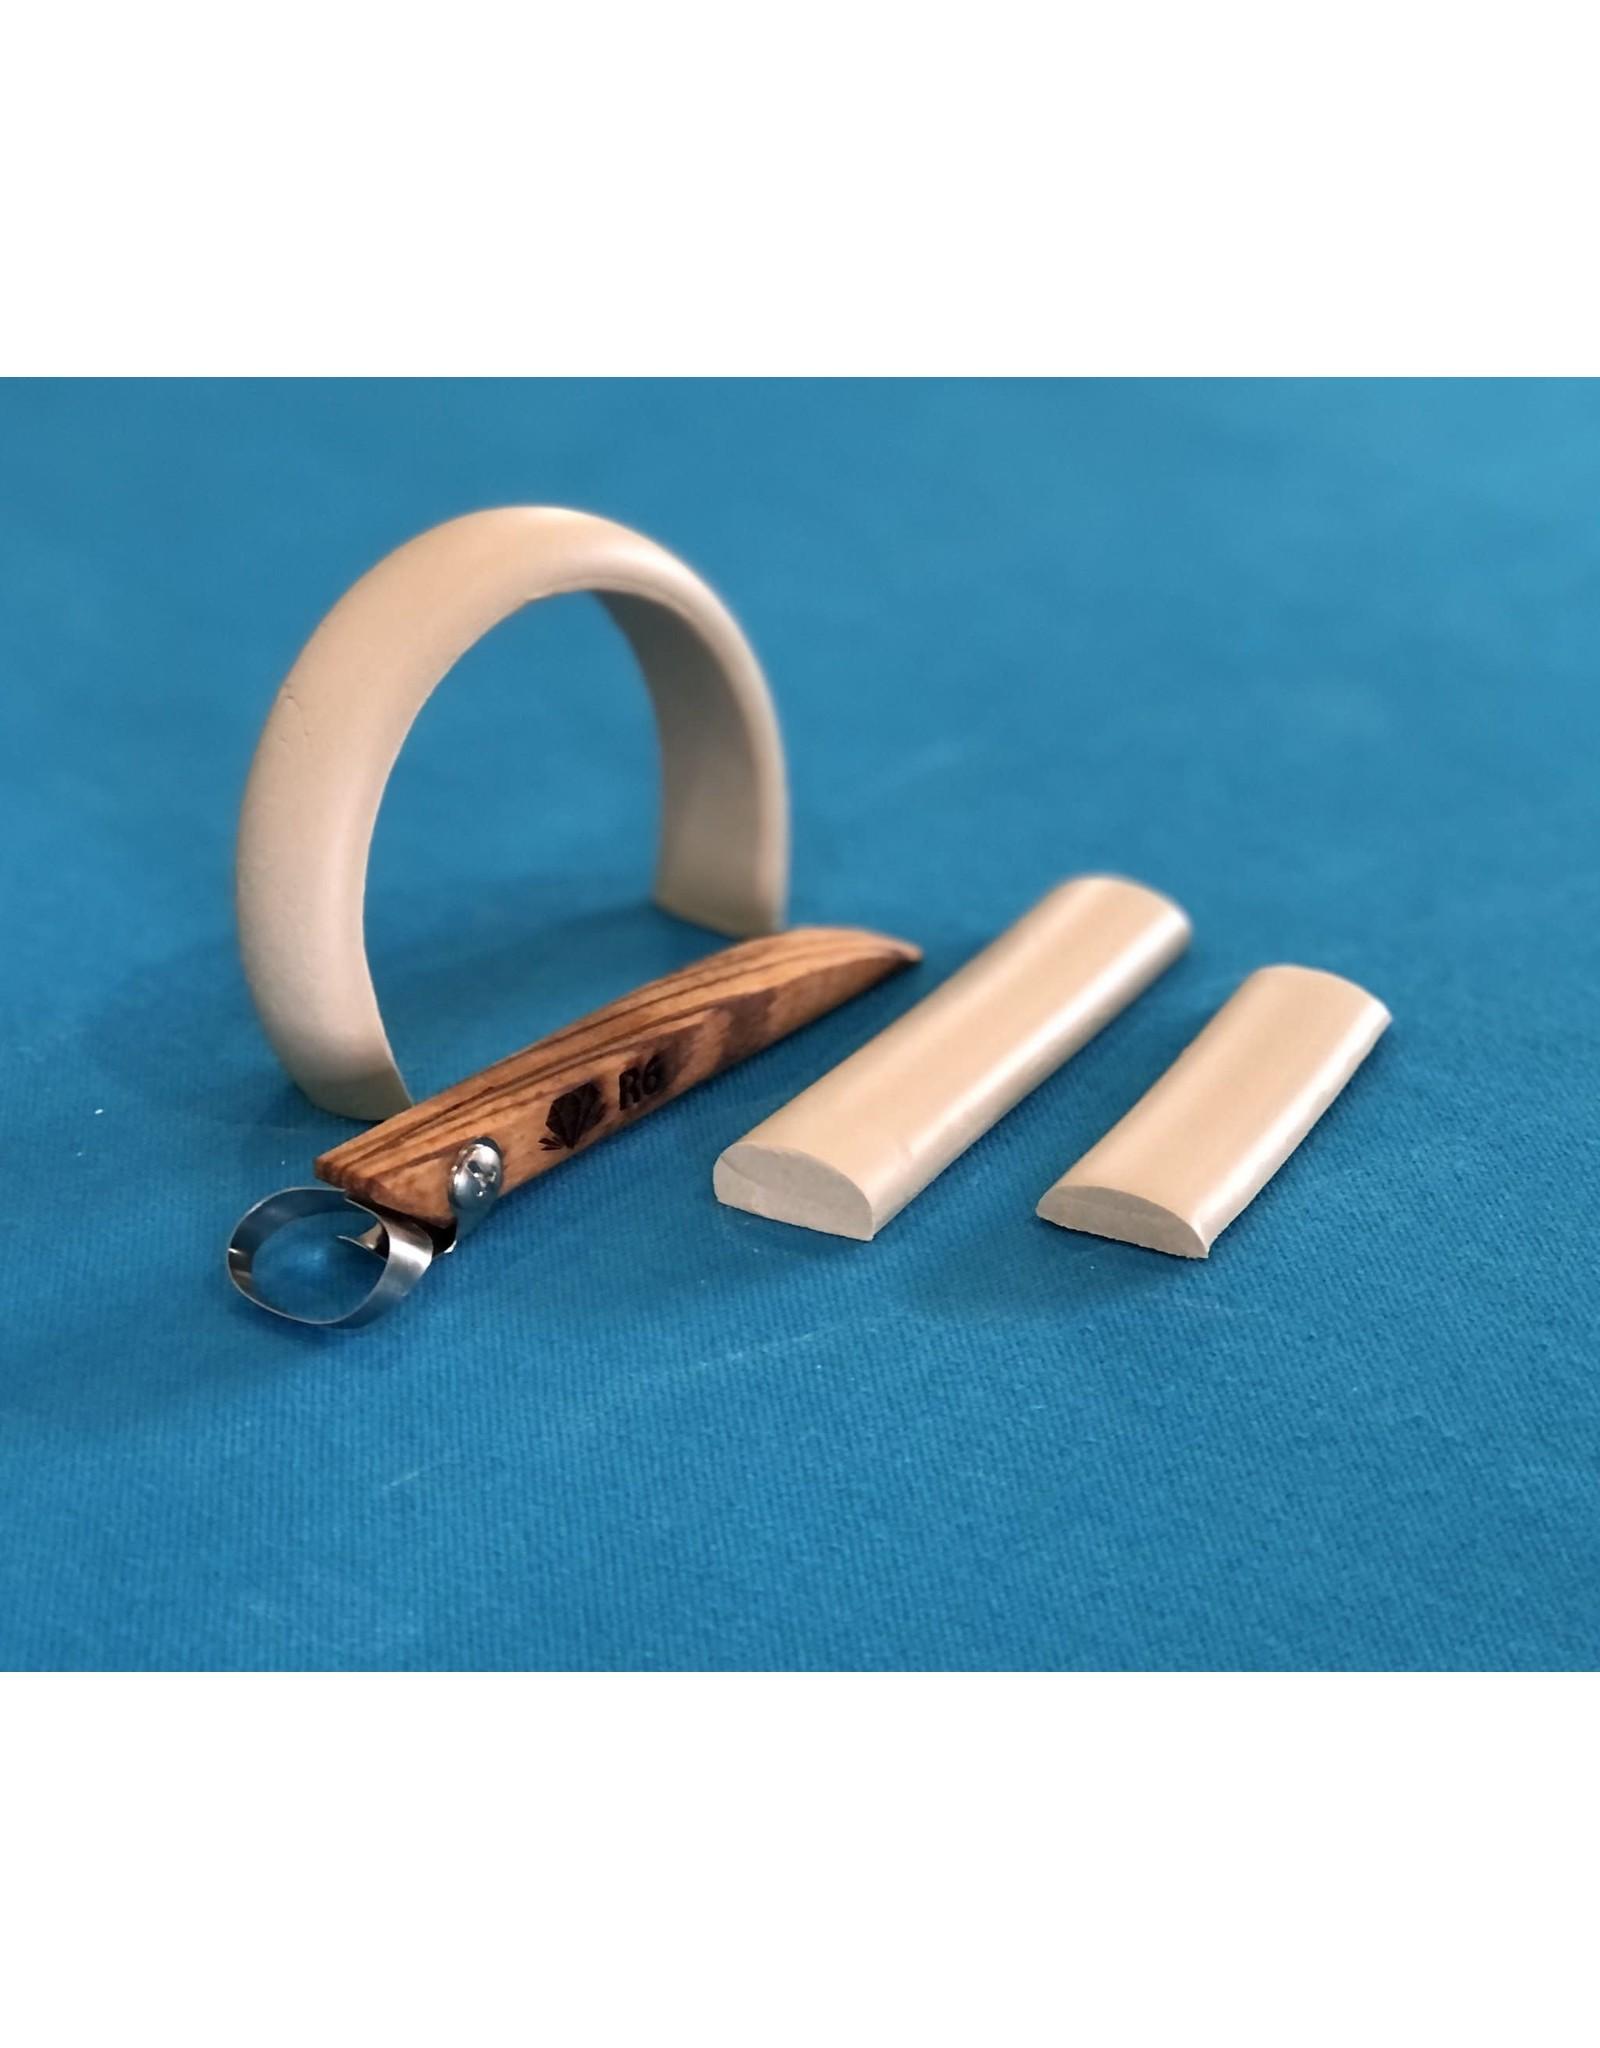 Diamondcore Tools (R6) Basic Oval Handheld Clay Extruder